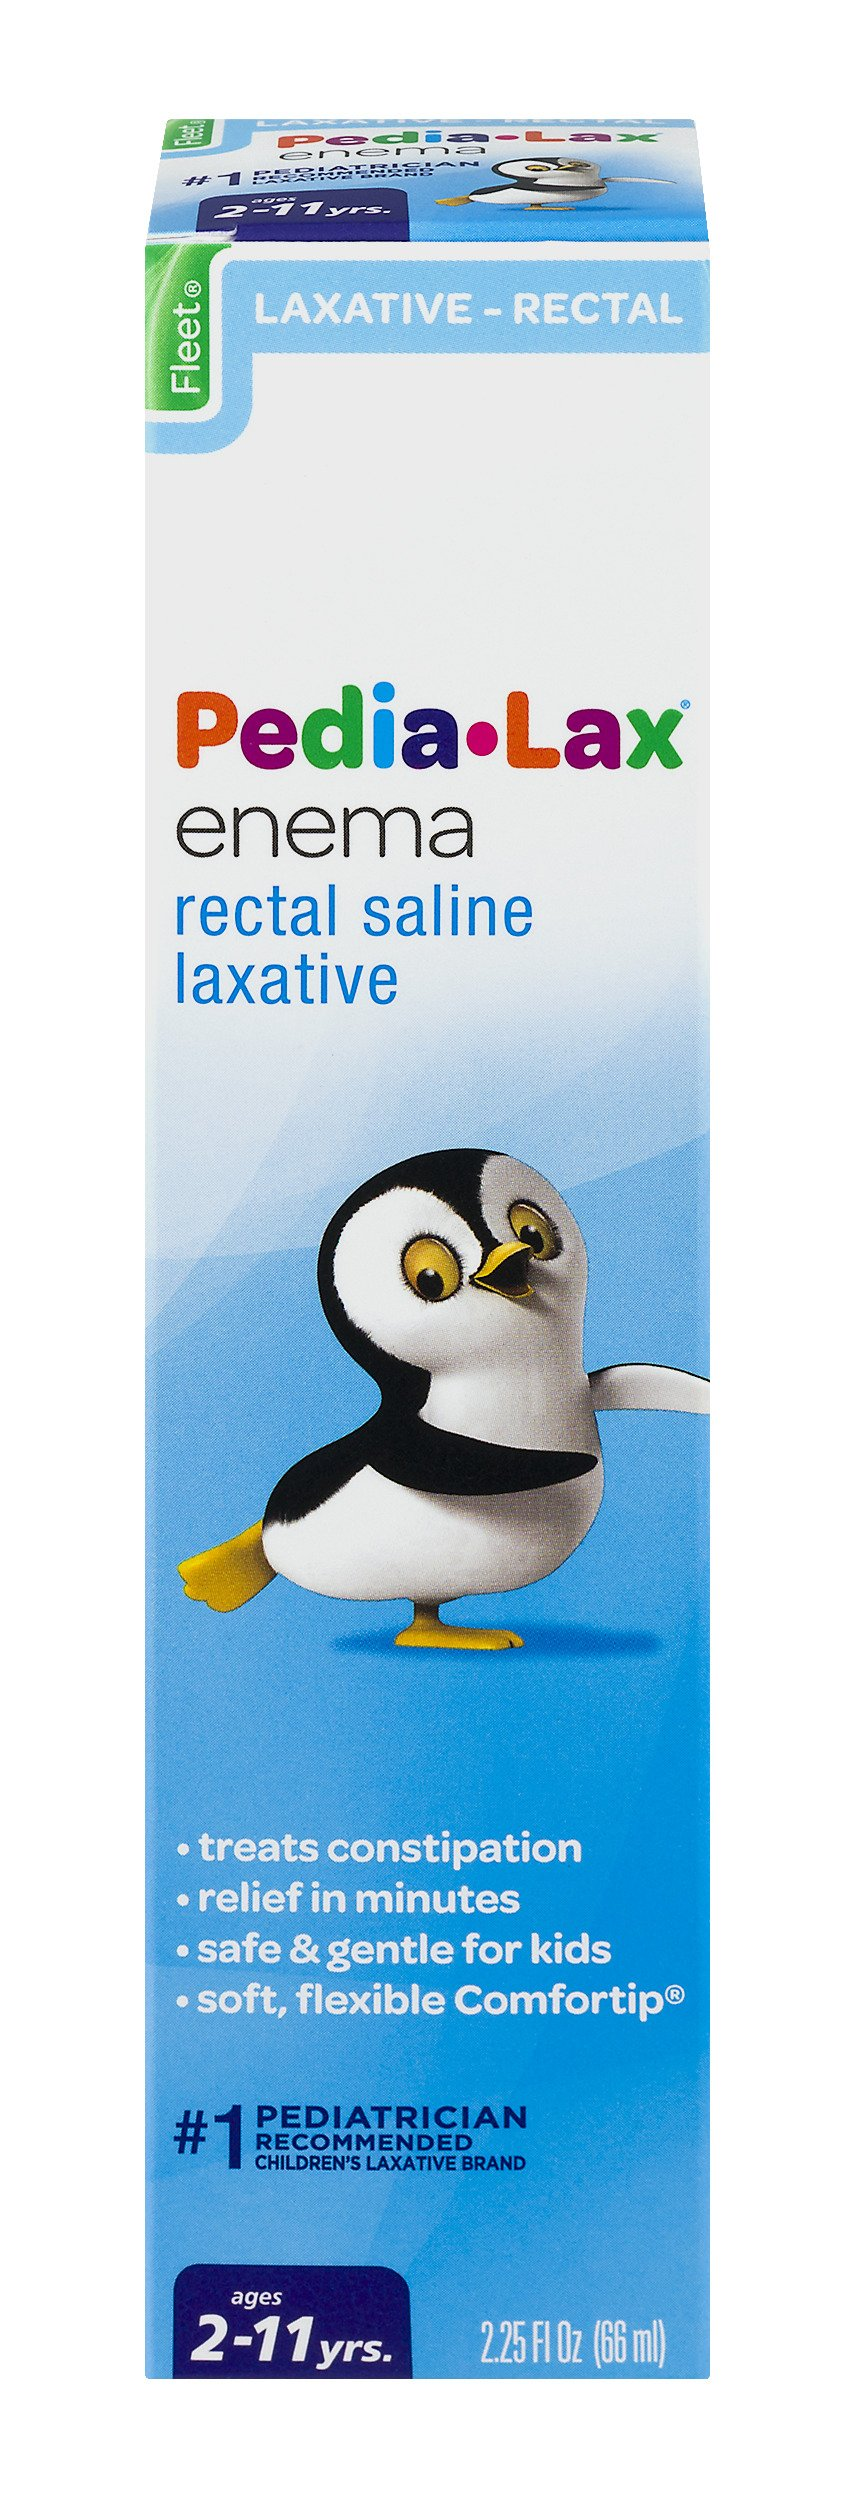 Pedia-Lax Rectal Saline Laxative Enema | Treats